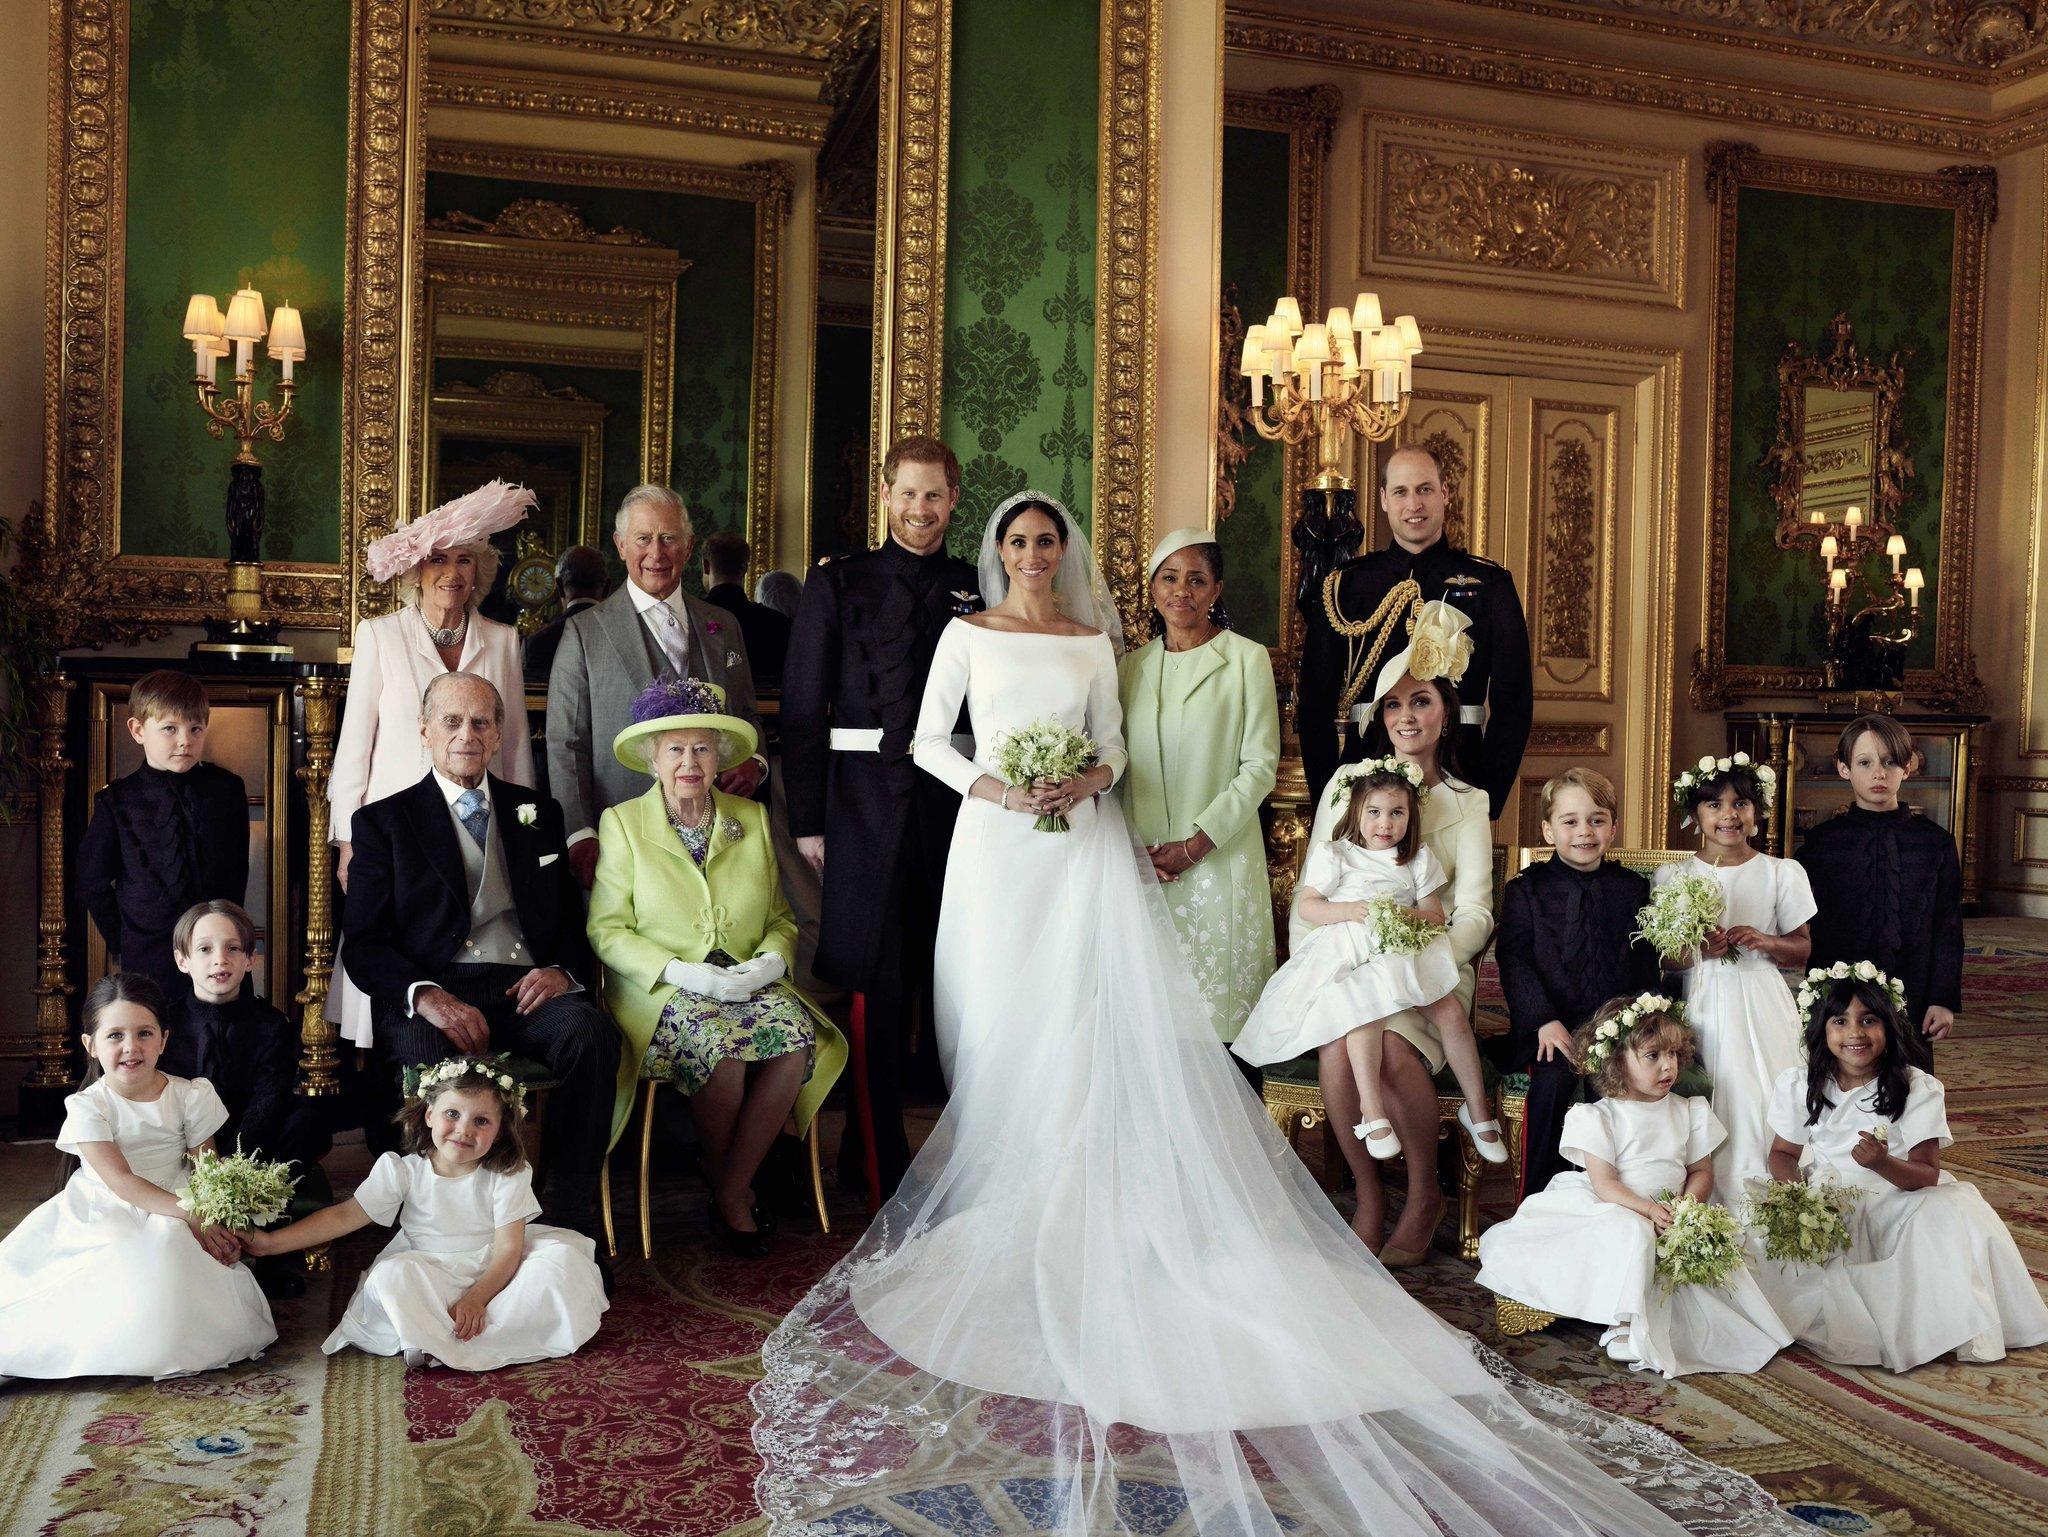 Offizielles Royal-Familienfoto – Fans wundern sich: Einer fehlt!